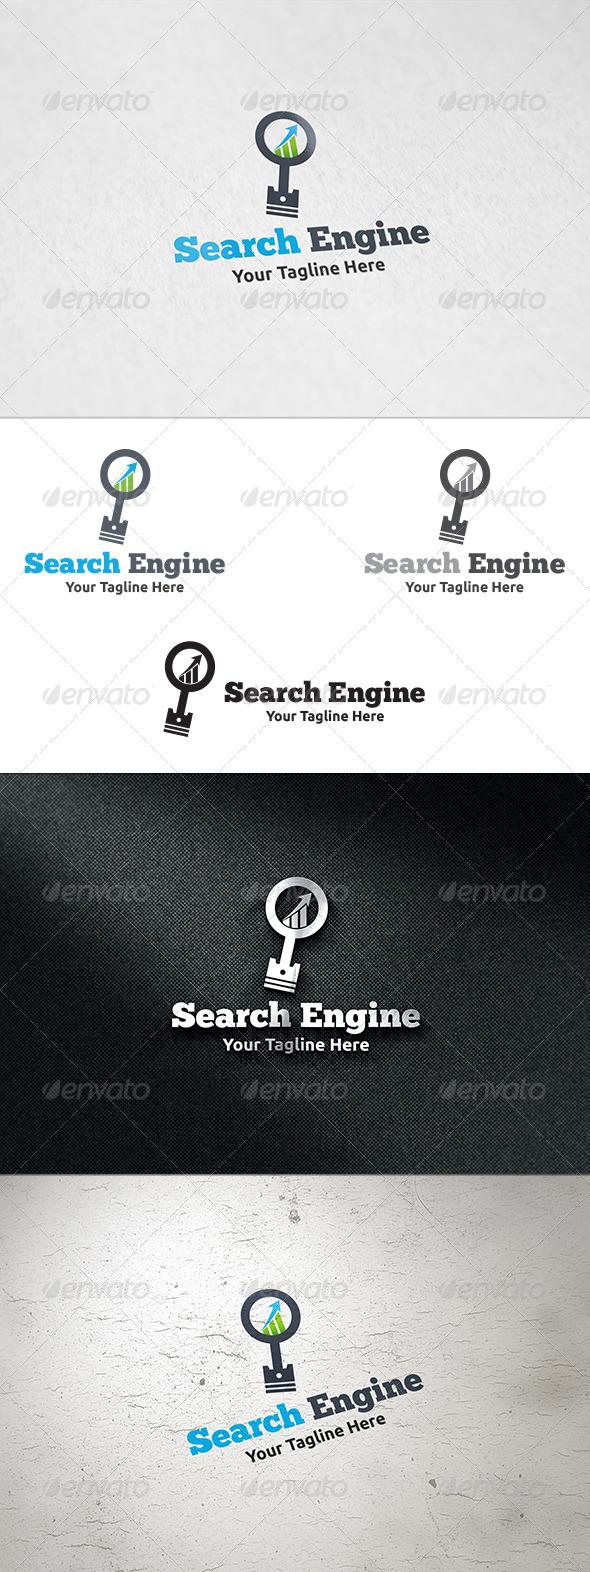 GraphicRiver Search Engine Logo Template 8429112